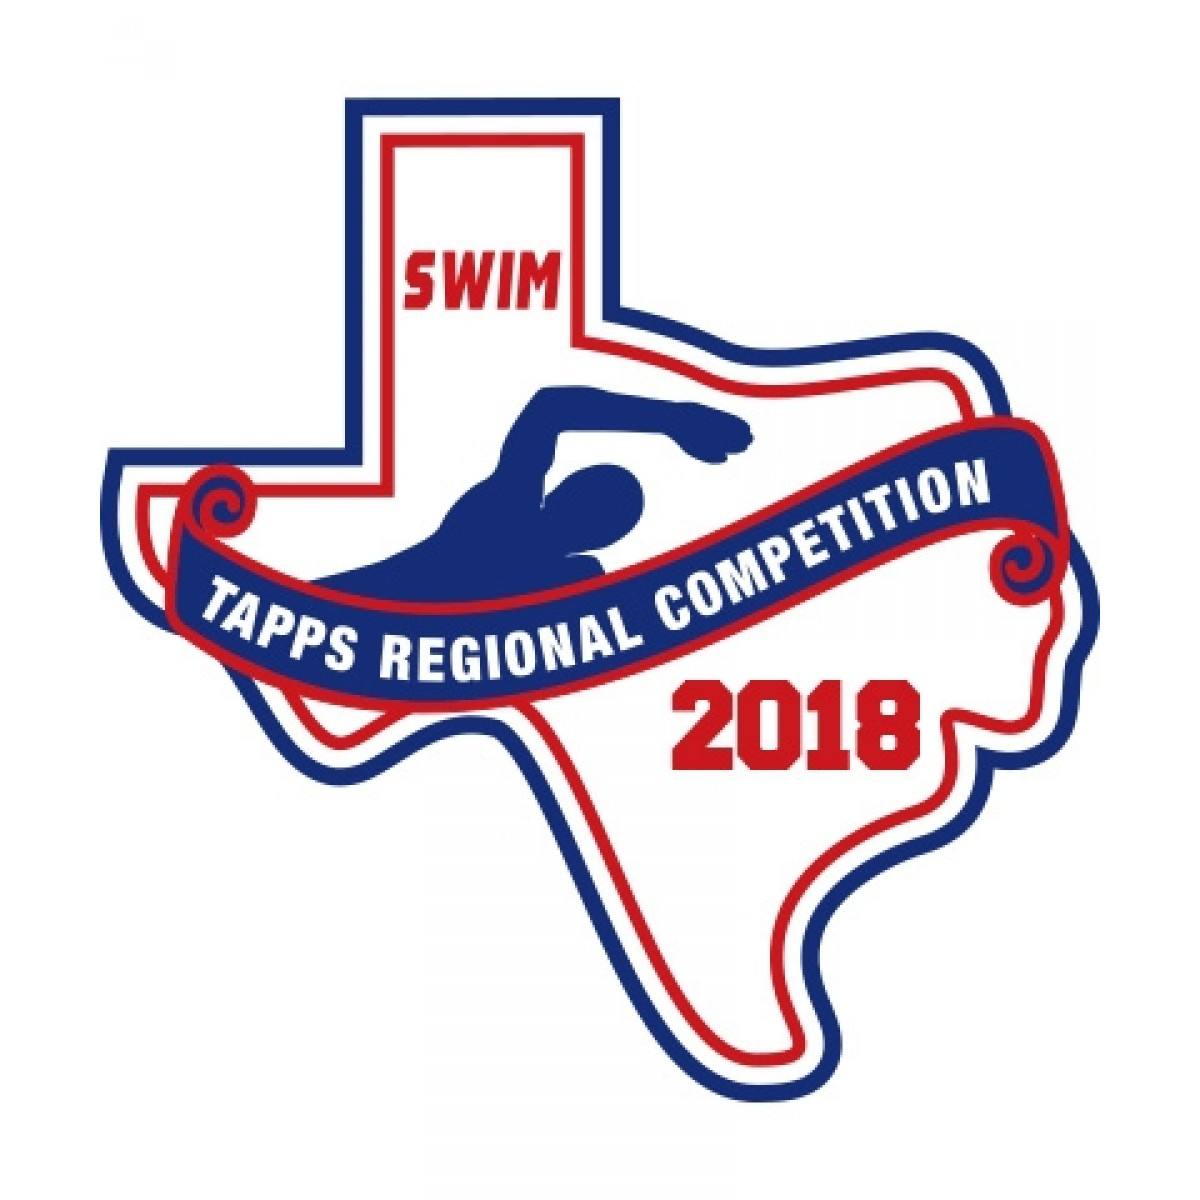 Chenille 2018 TAPPS Swim Regional Patch